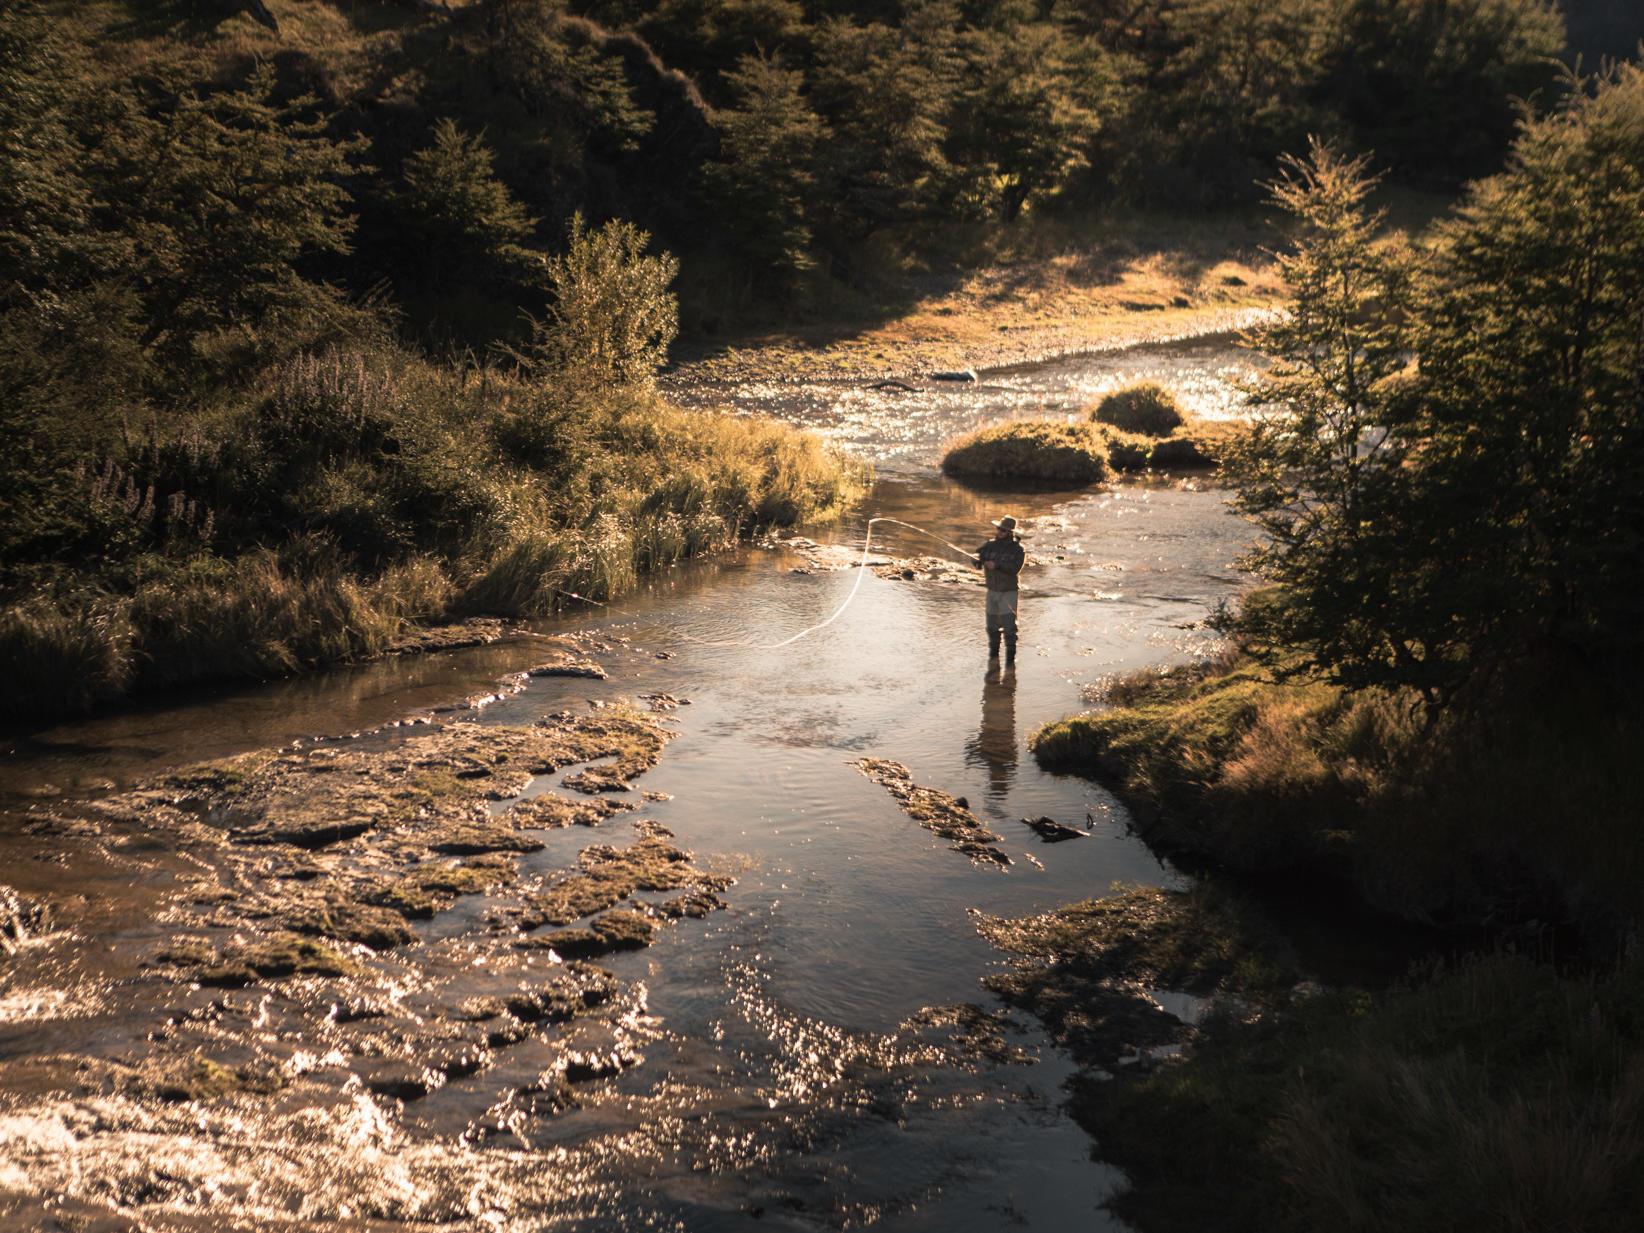 Excursión Pesca con Mosca Patagonia